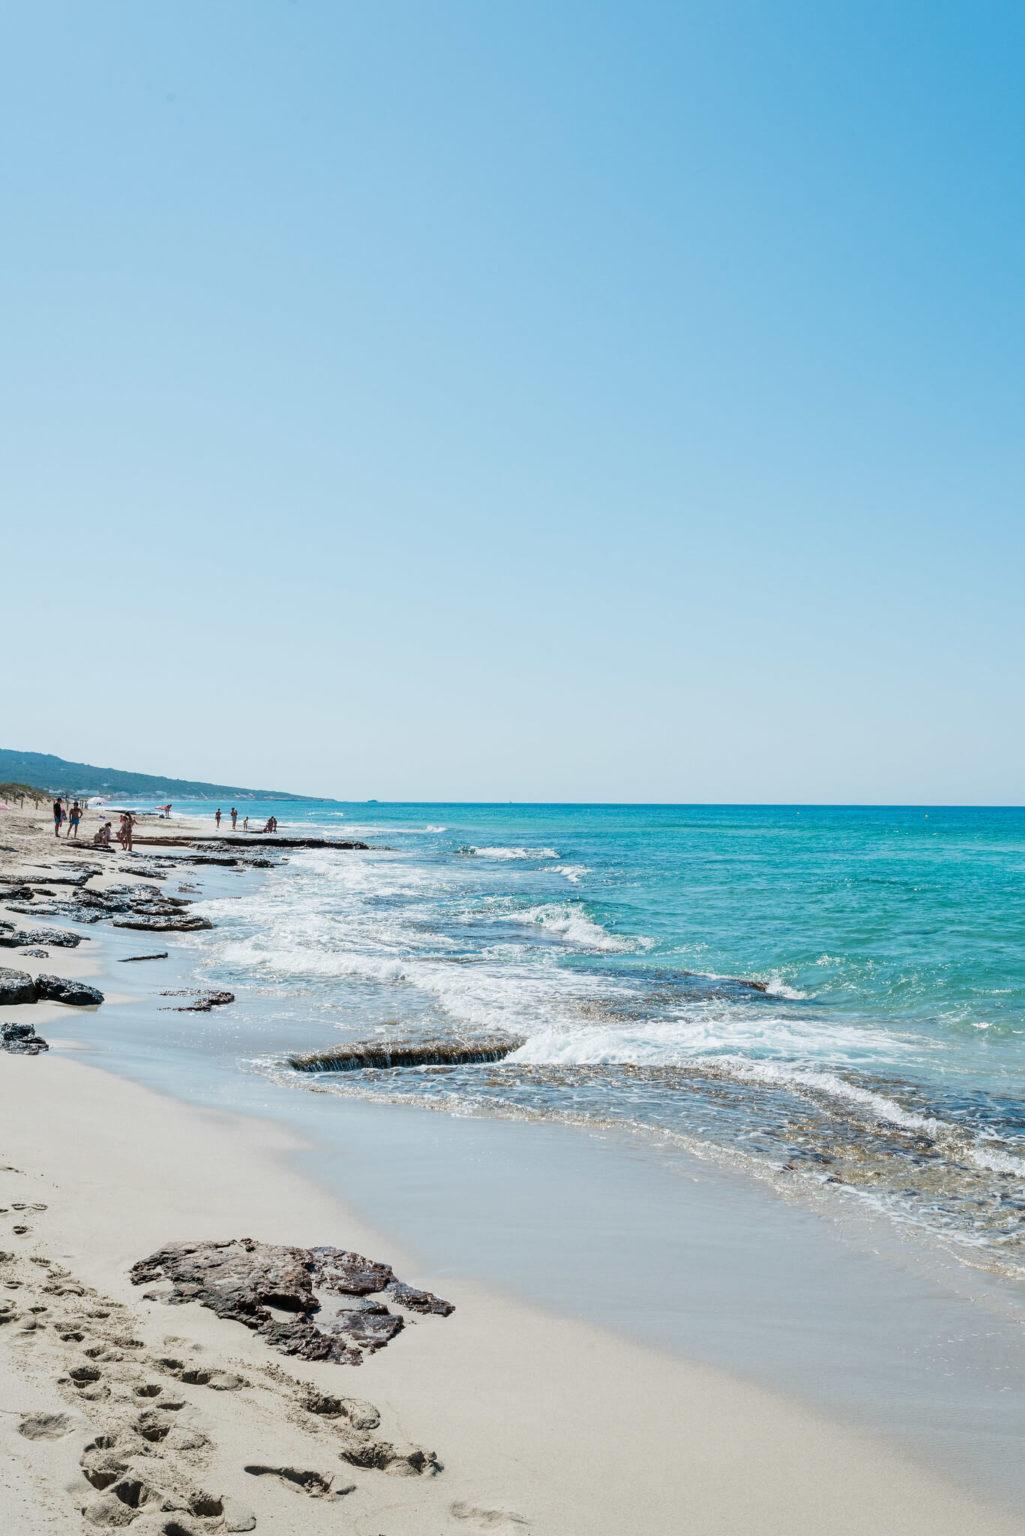 https://www.white-ibiza.com/wp-content/uploads/2020/03/formentera-beaches-migjorn-2020-03-1025x1536.jpg